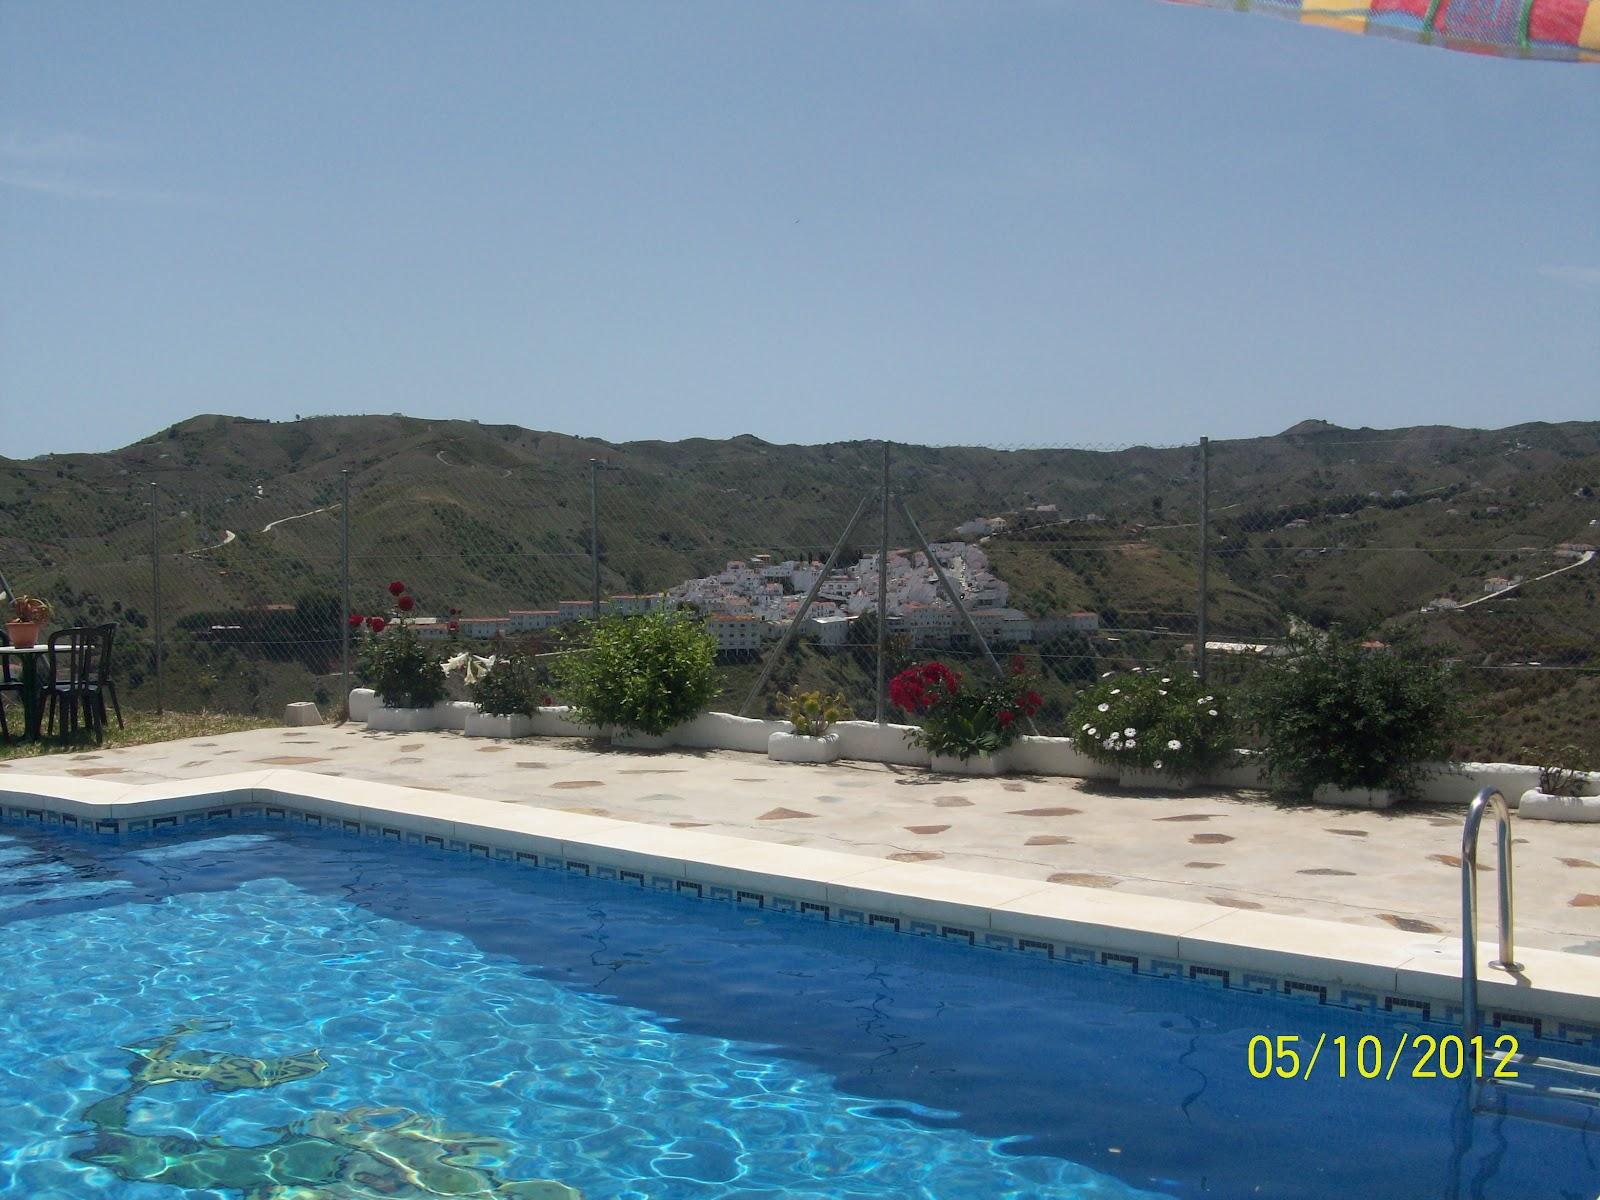 Casa villalba piscina con vistas al pueblo de almachar a for Piscina villalba